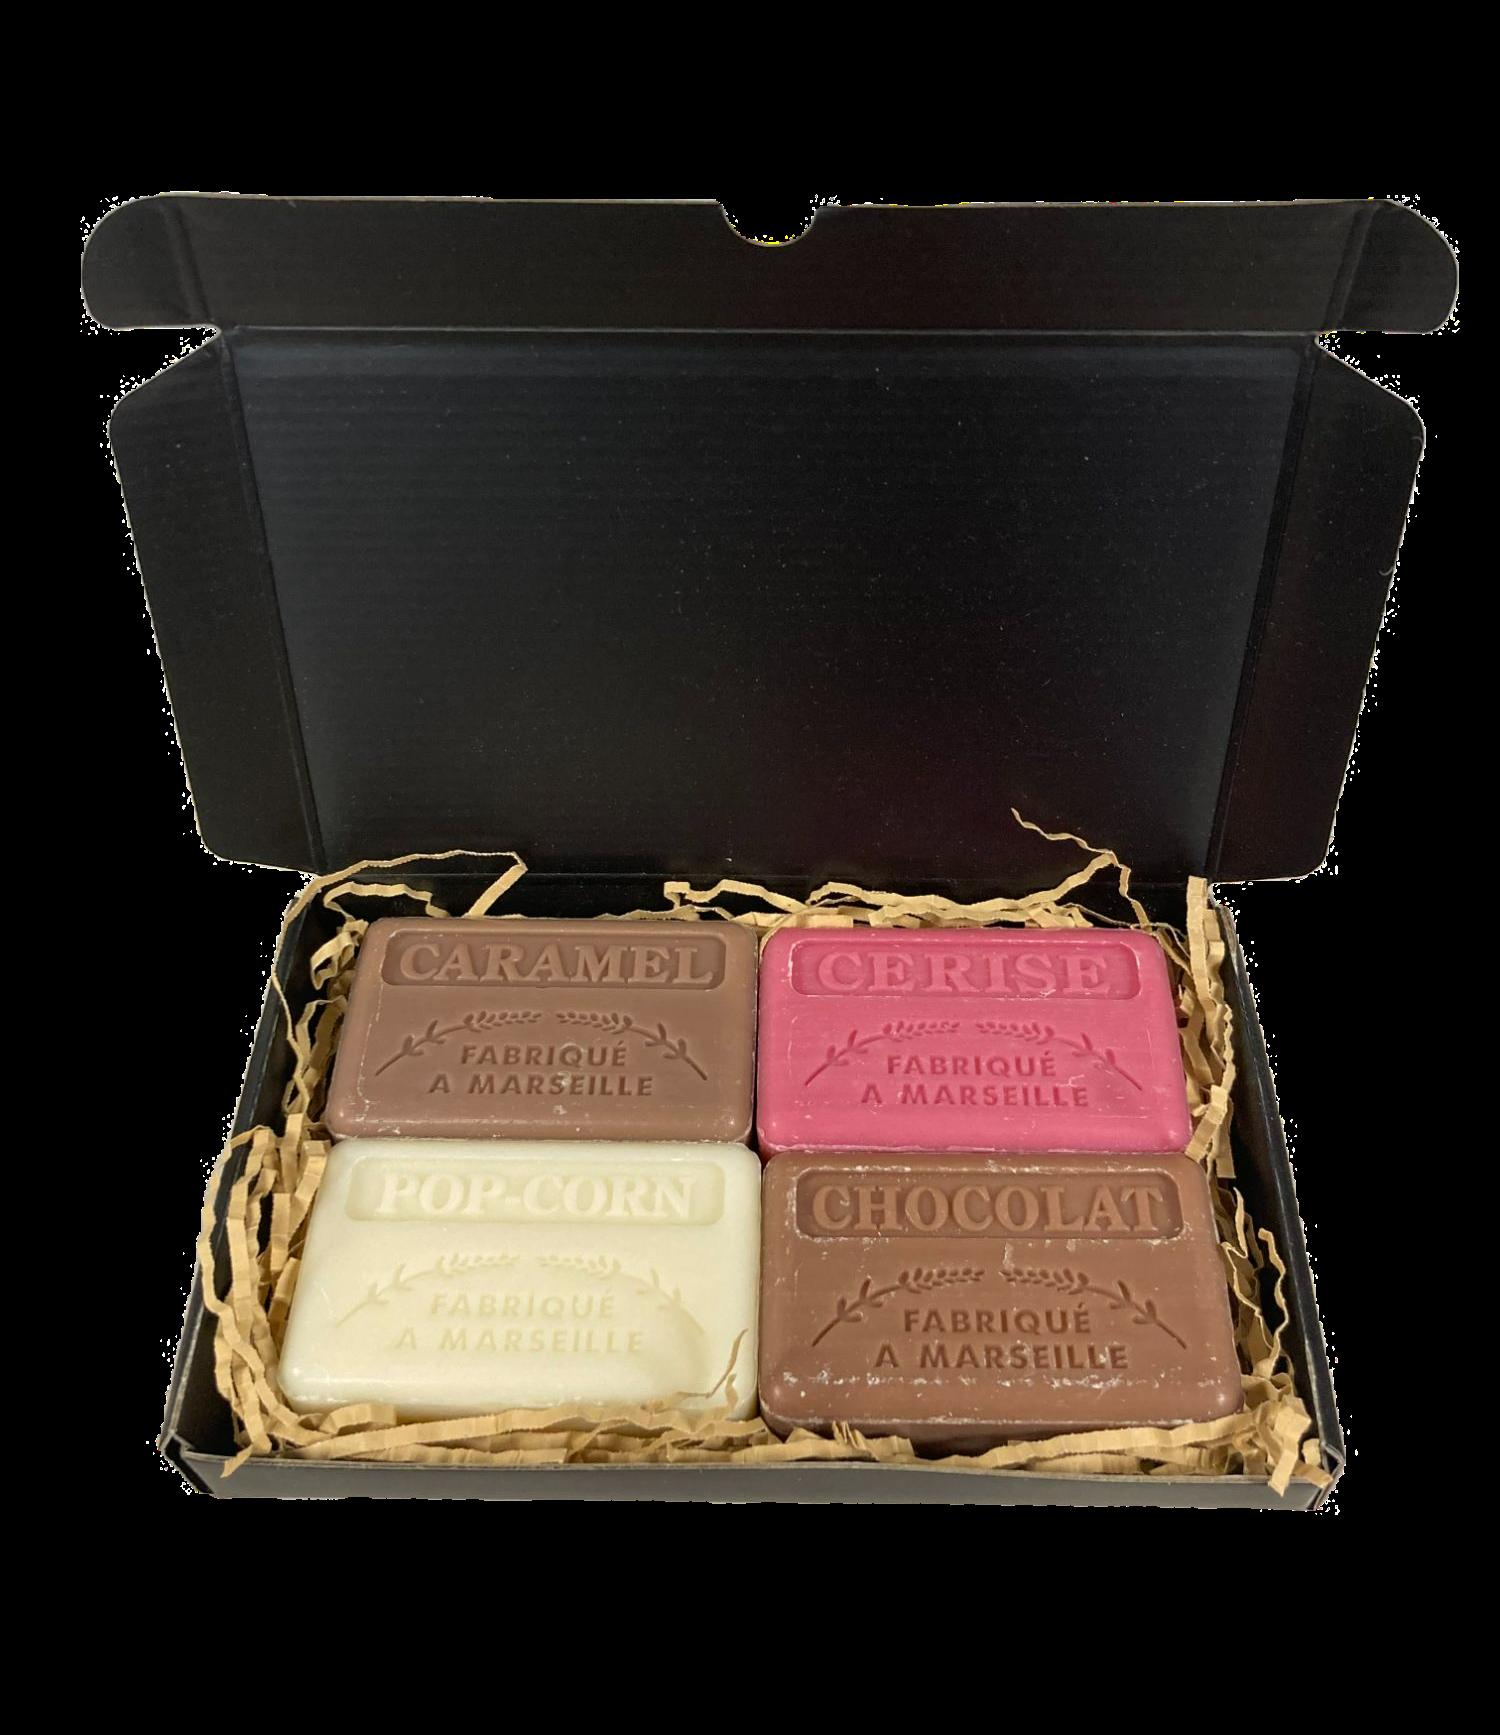 Zeep brievenbuscadeau: Caramel, Kers, Pop-Corn, Chocolade